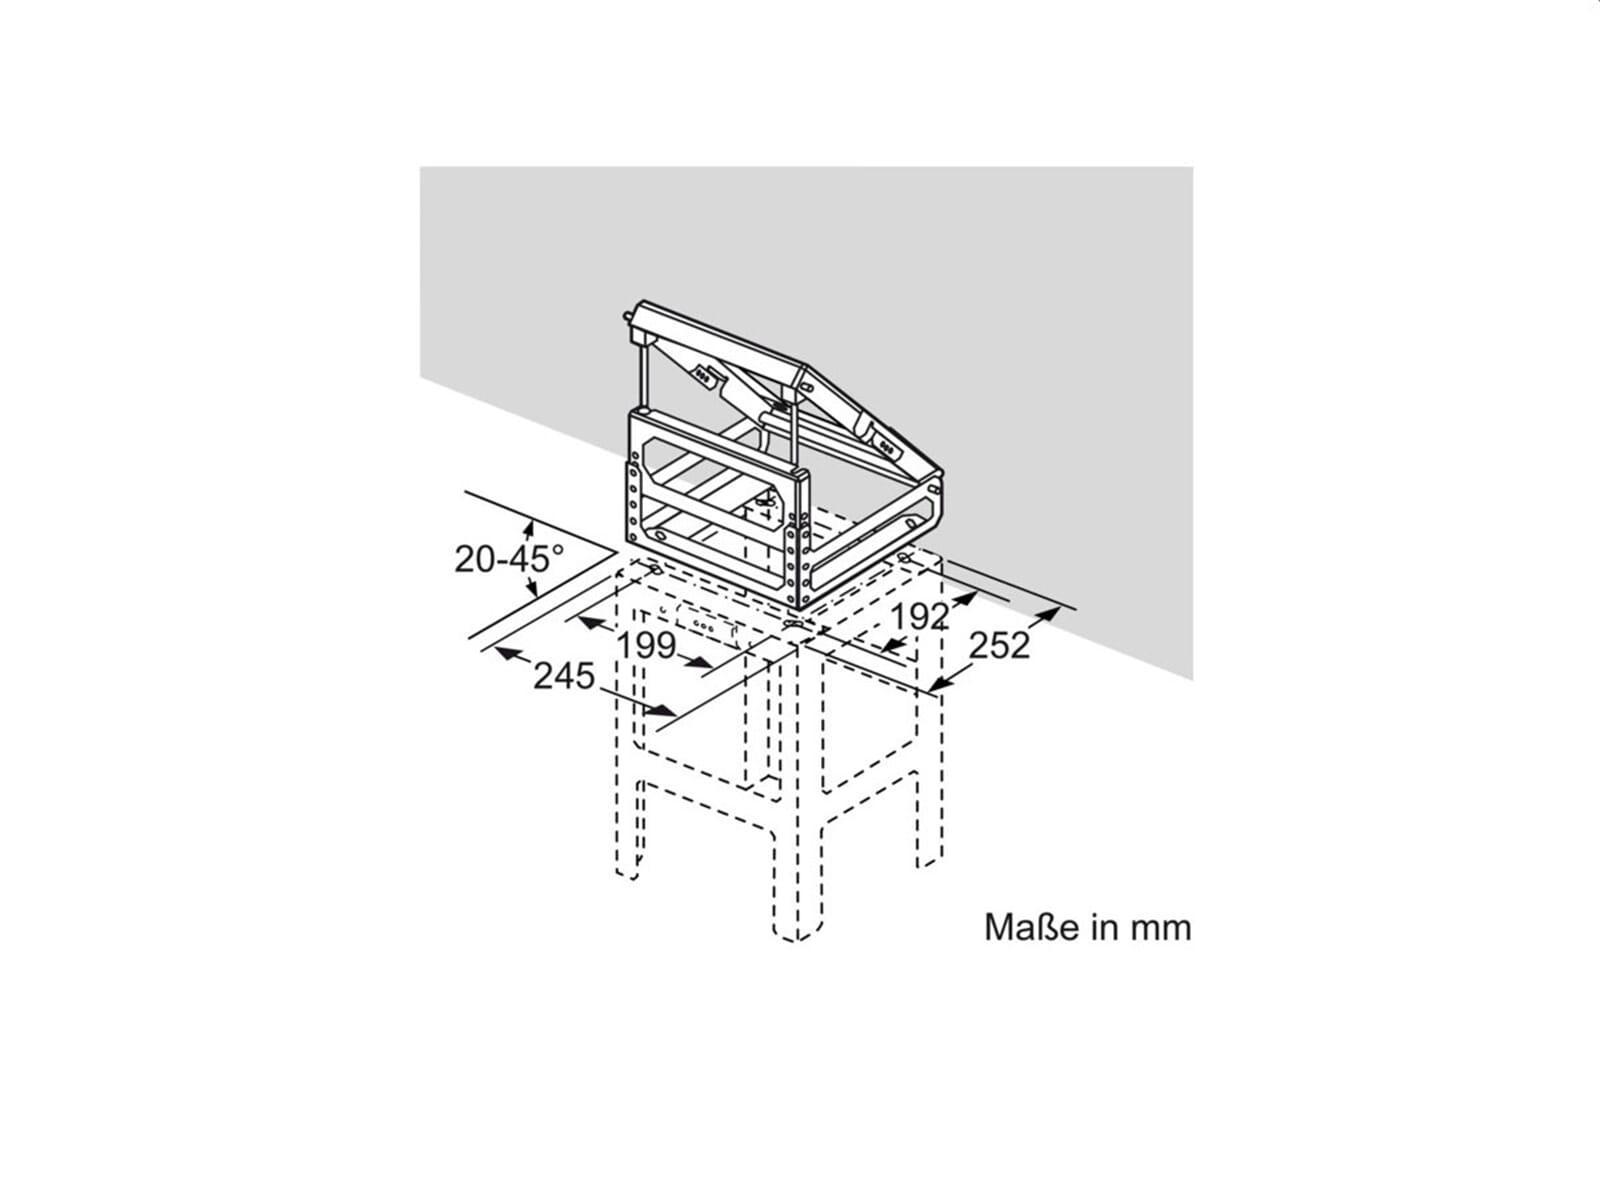 neff z5911x0 adapter f r dachschr gen f r 78 90 eur. Black Bedroom Furniture Sets. Home Design Ideas